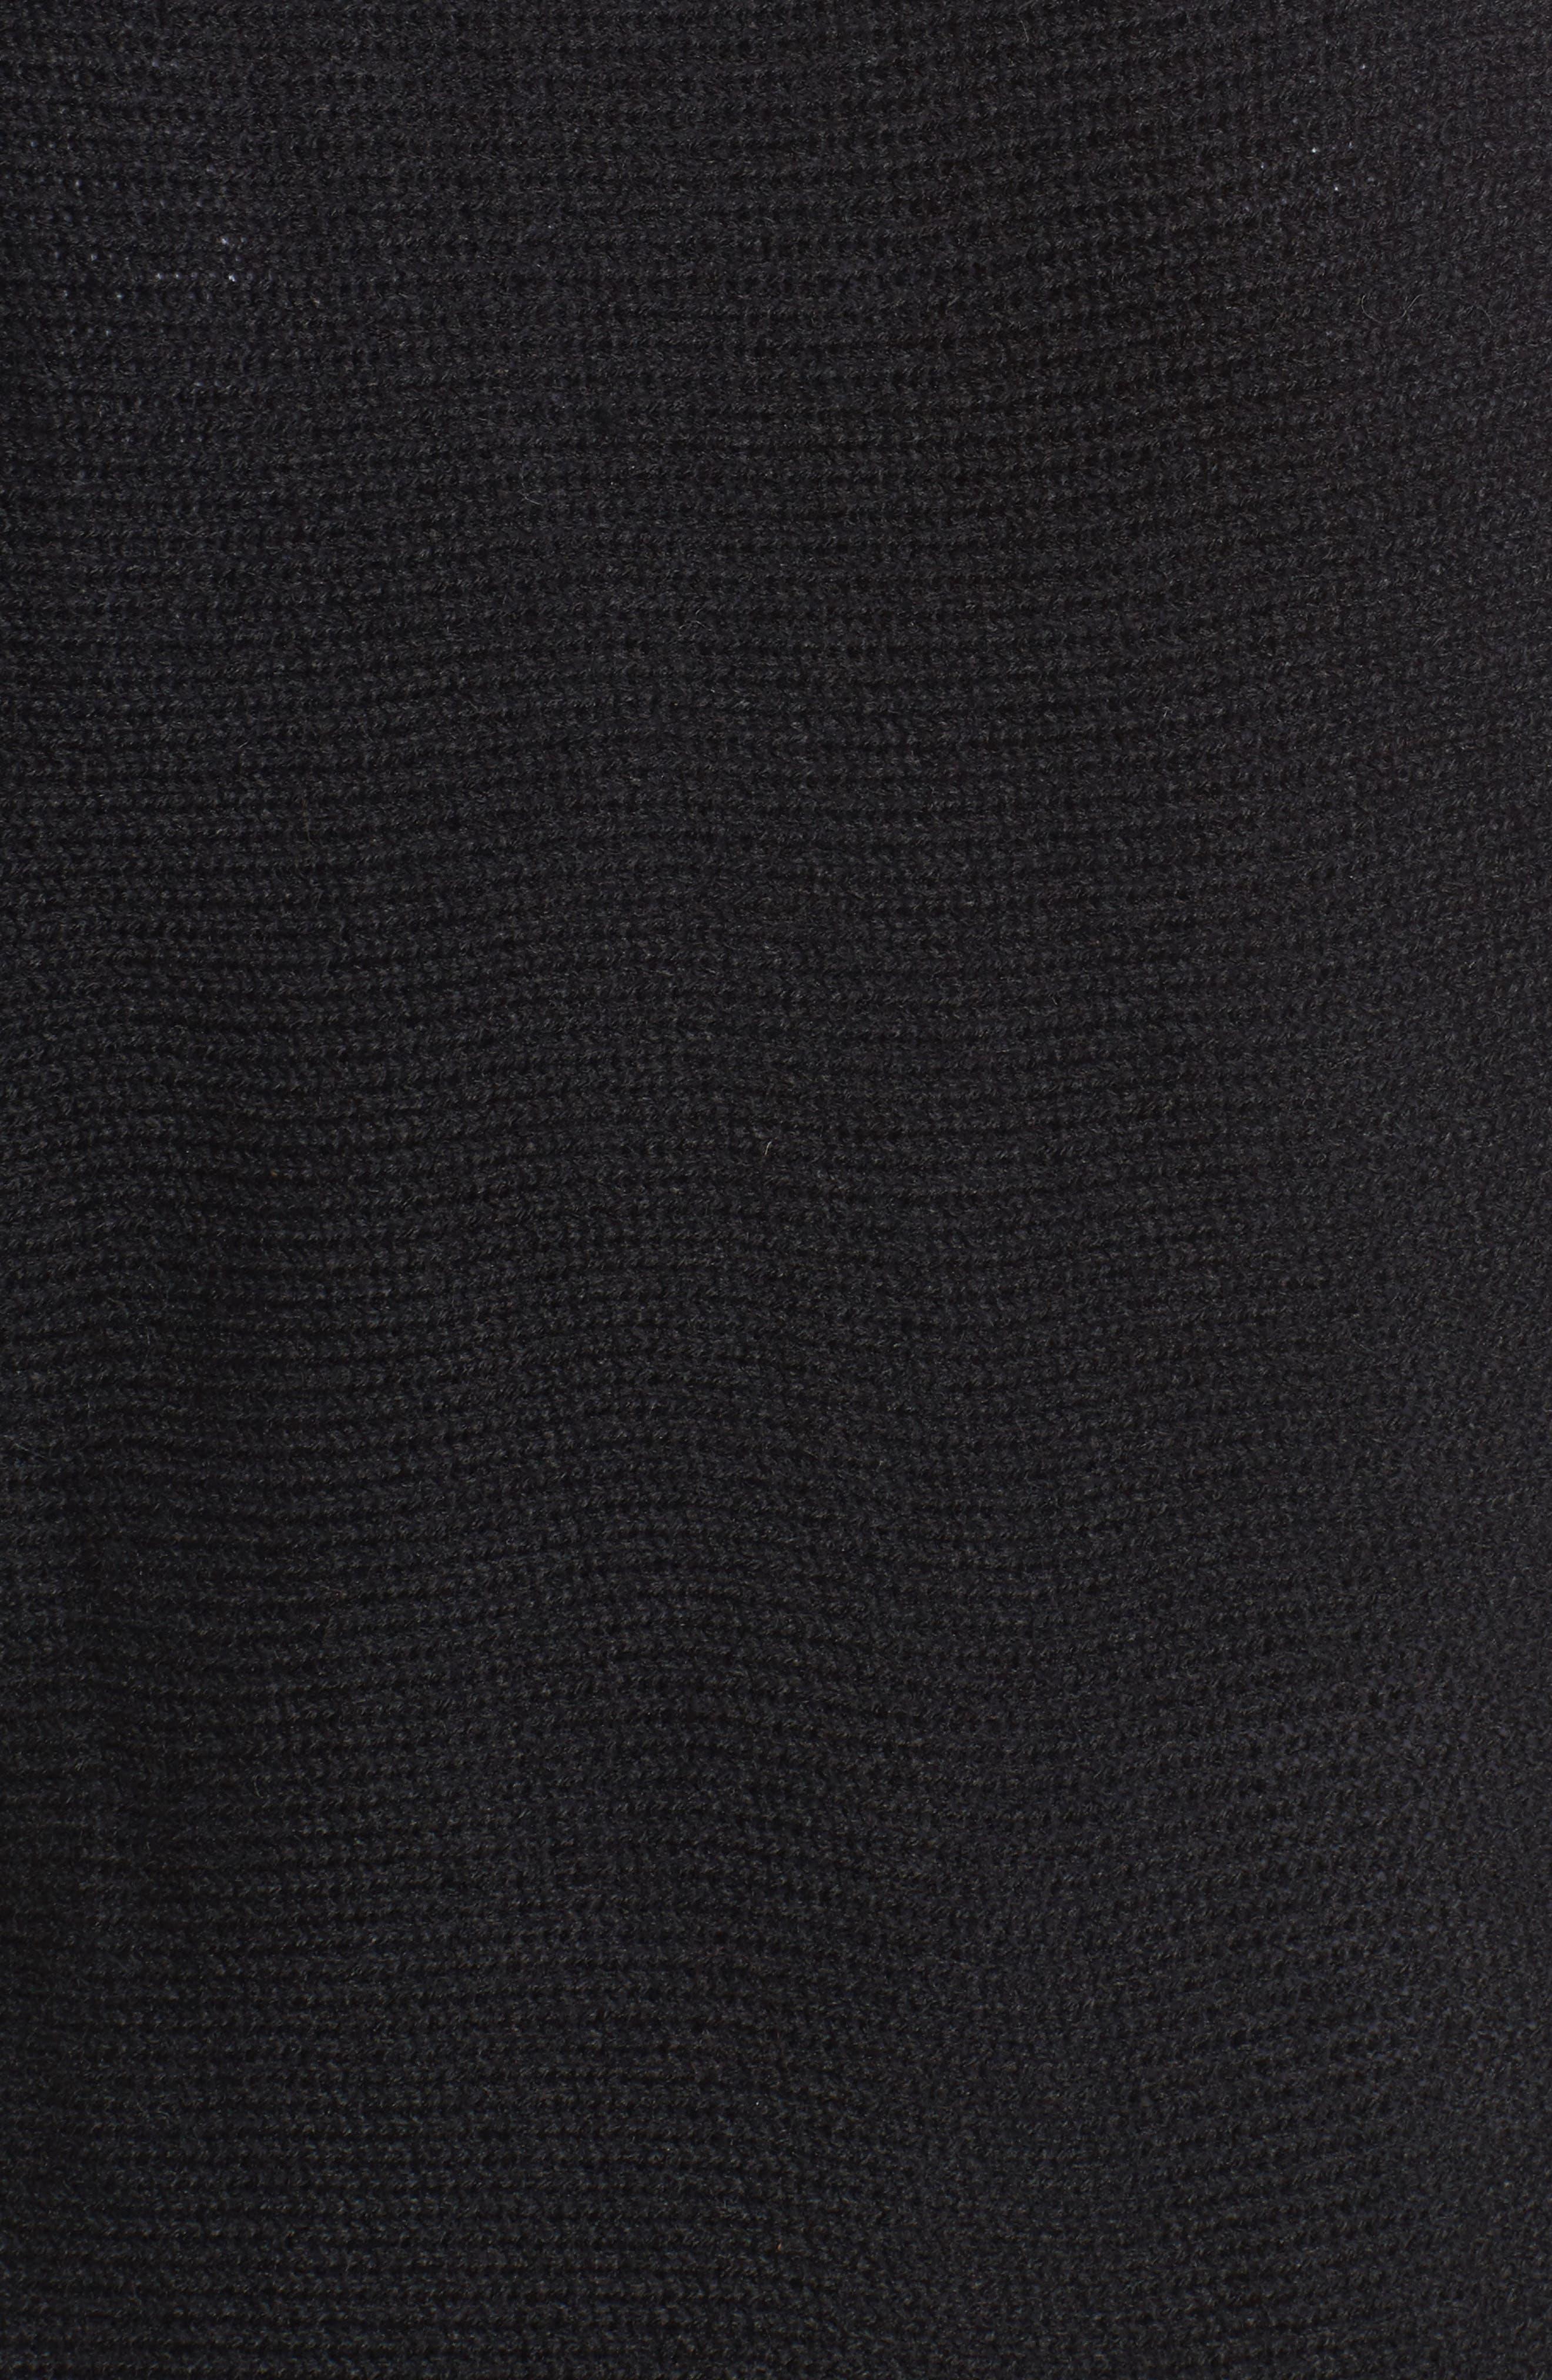 Faded Stripes Knit Vest,                             Alternate thumbnail 5, color,                             001